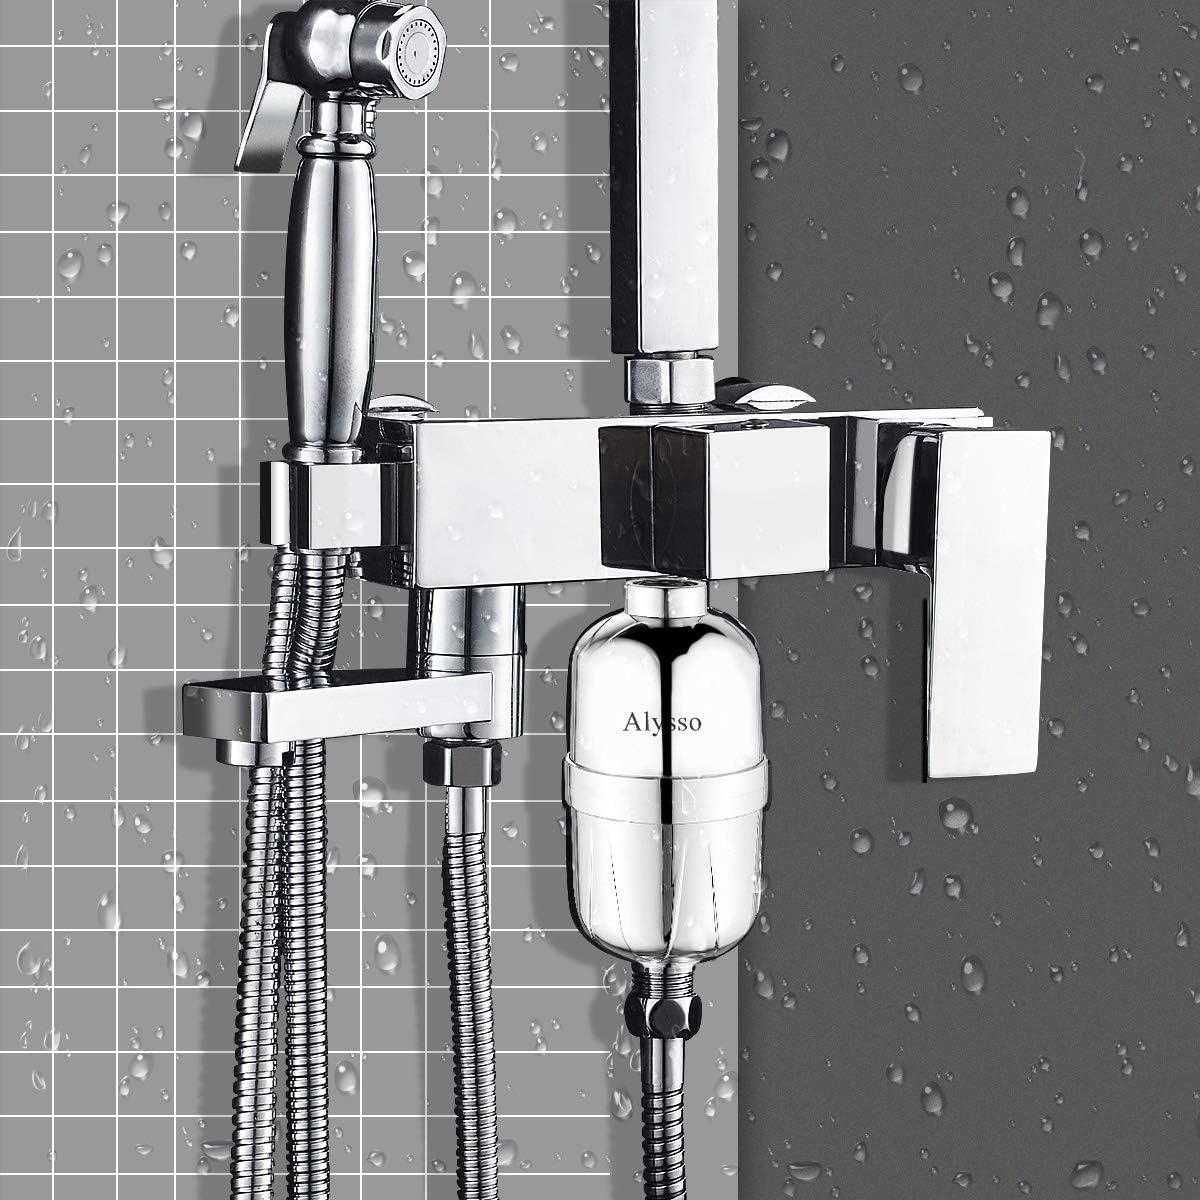 Alysso Shower Filter Chlorine 2019 Professional Reducing Chlorine Fluoride Heavy Metals Bacteria